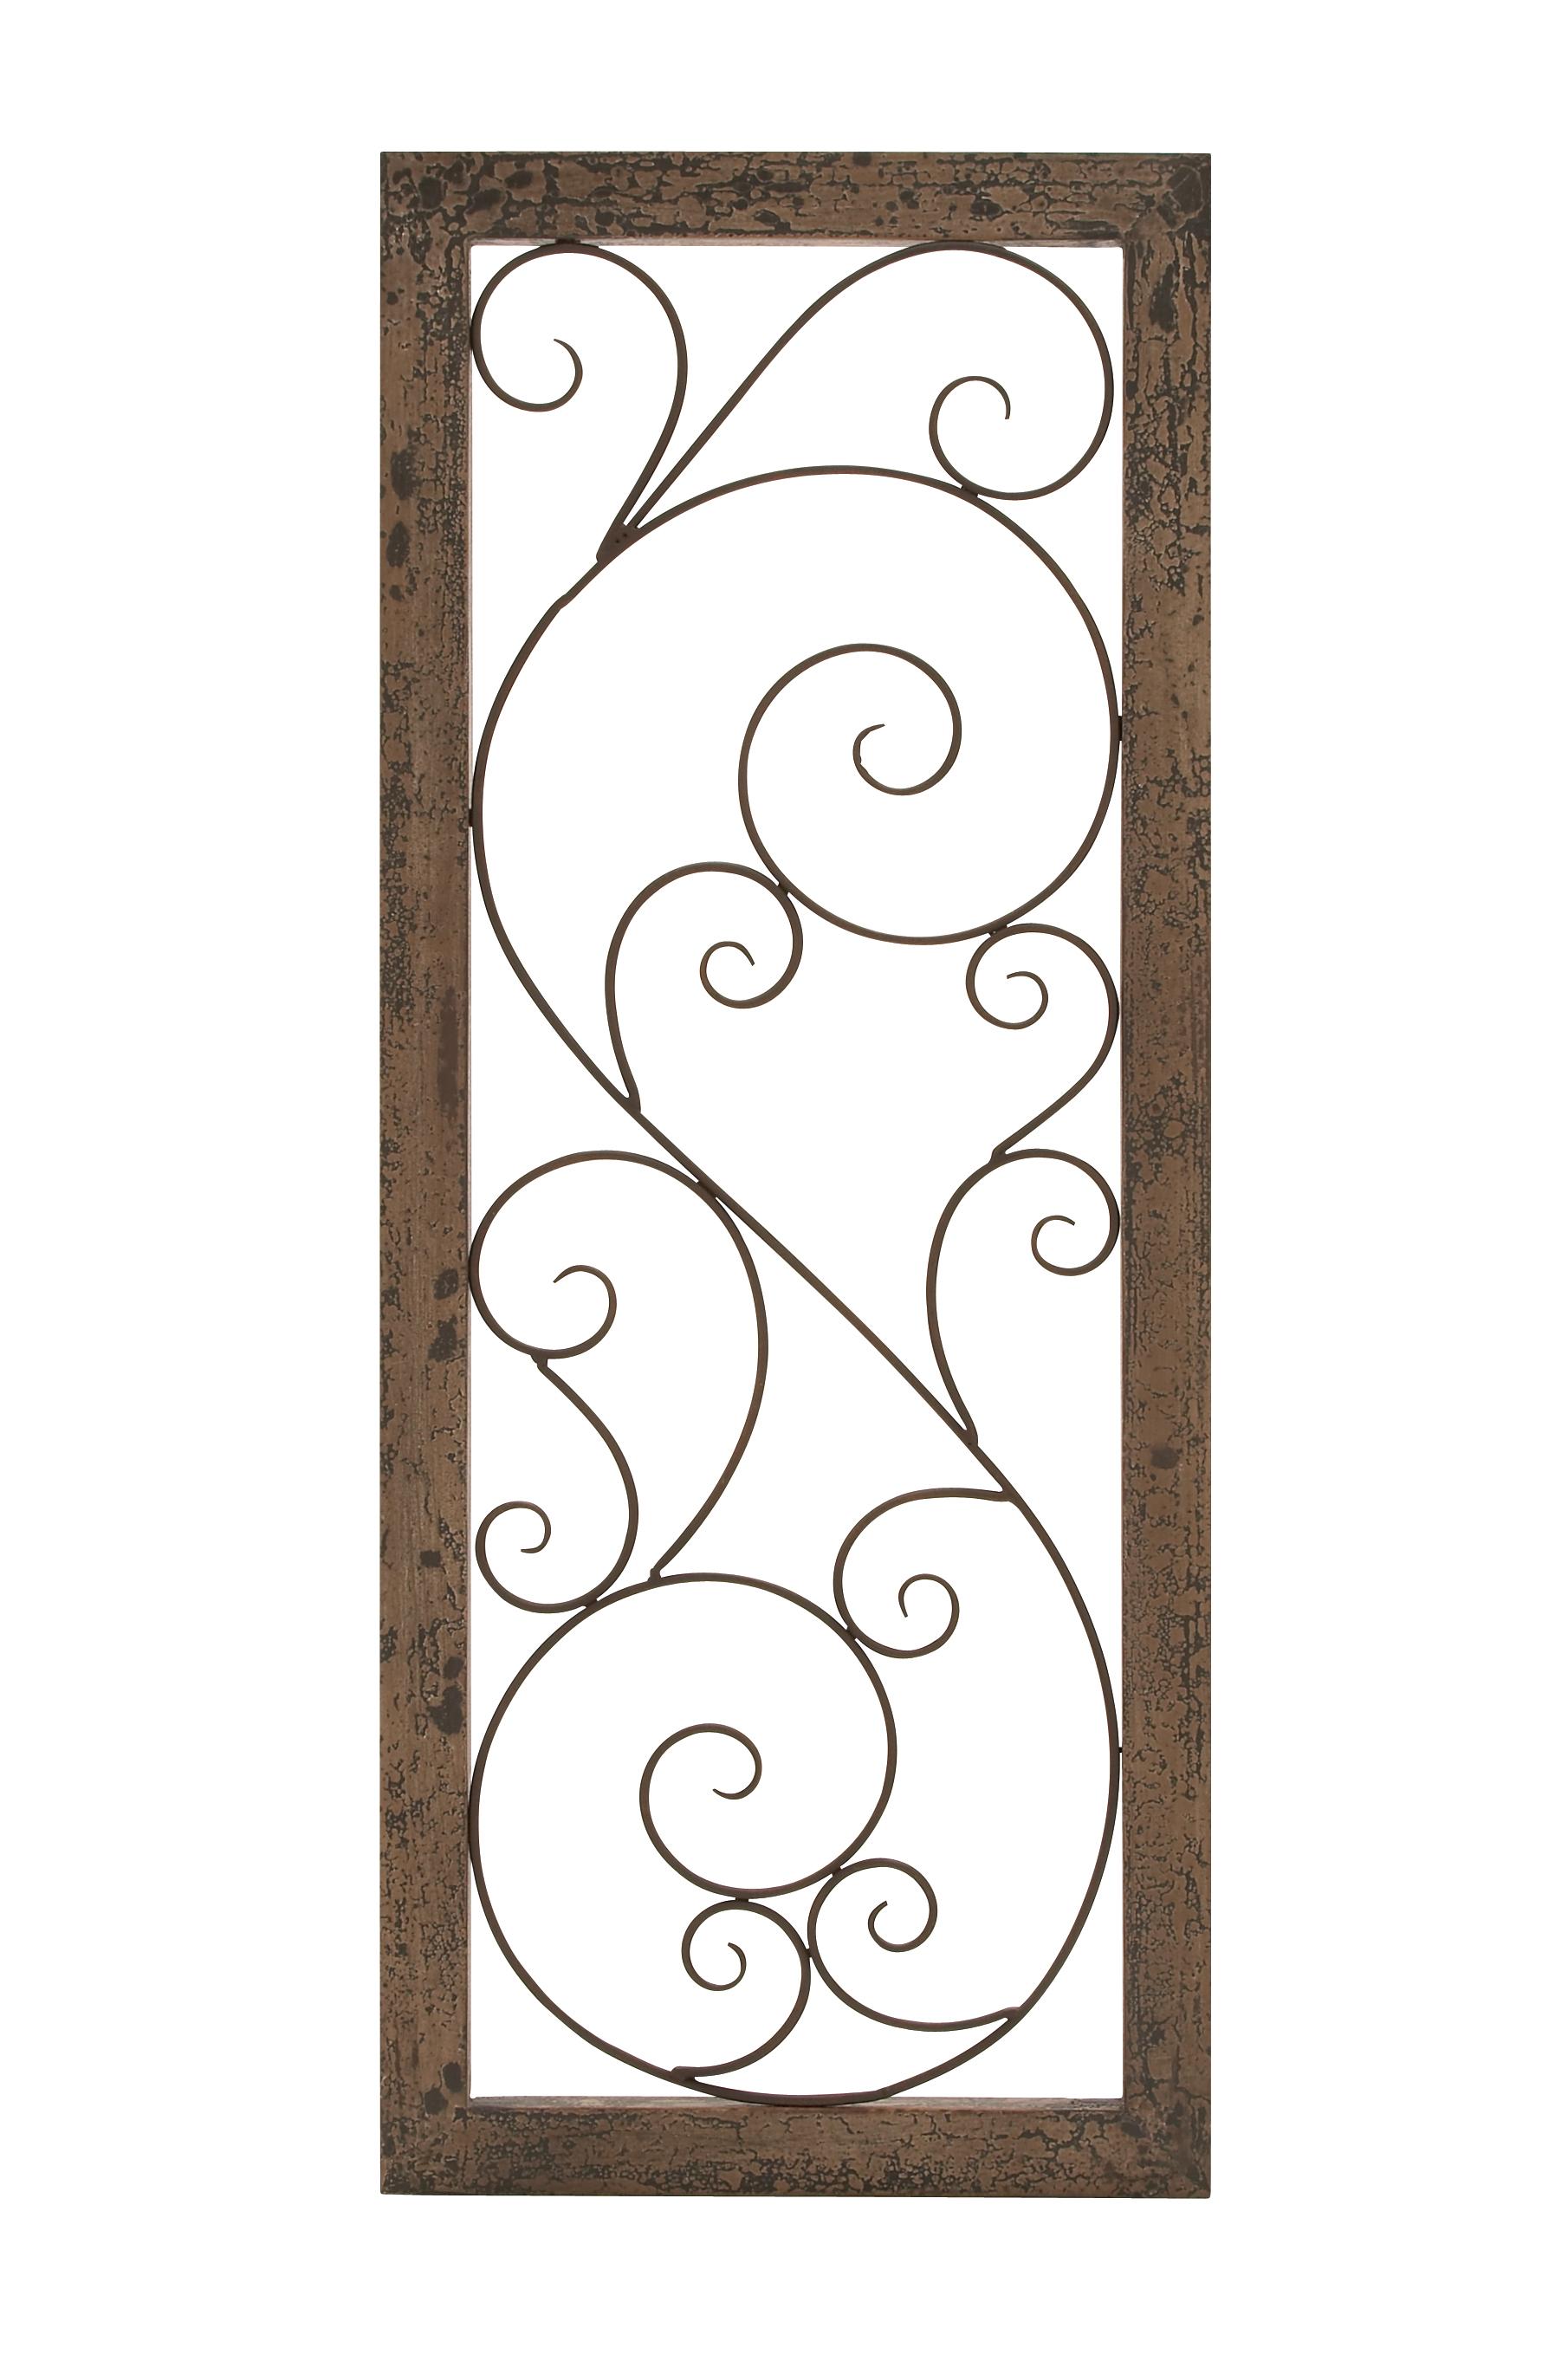 Woodland Imports Elegant Wall Panel Set Brown Wood Bronzed Metal Scroll Work Décor 52791